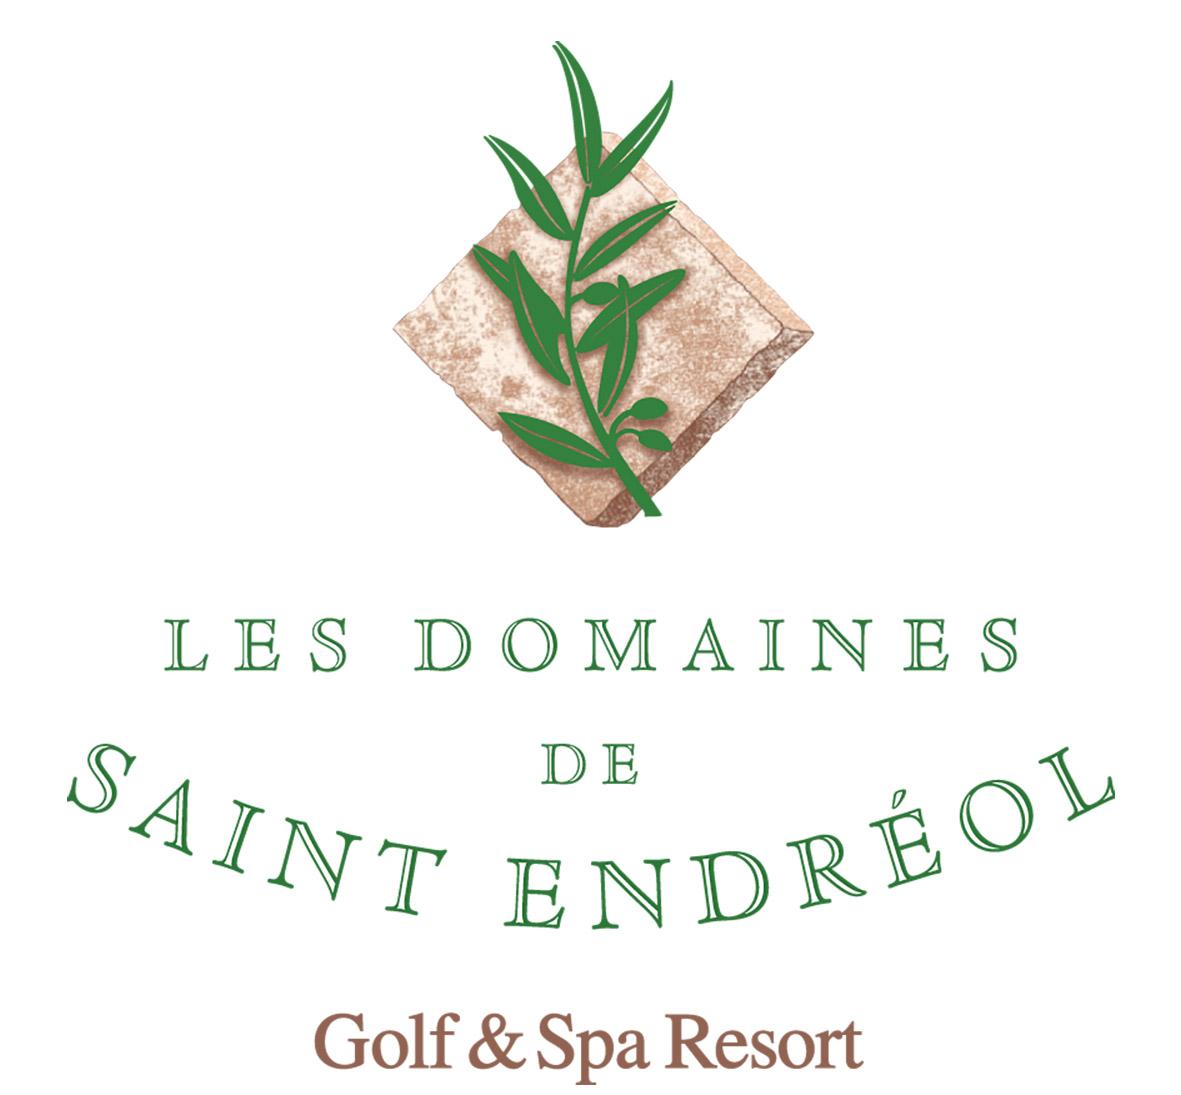 Saint-Endréol